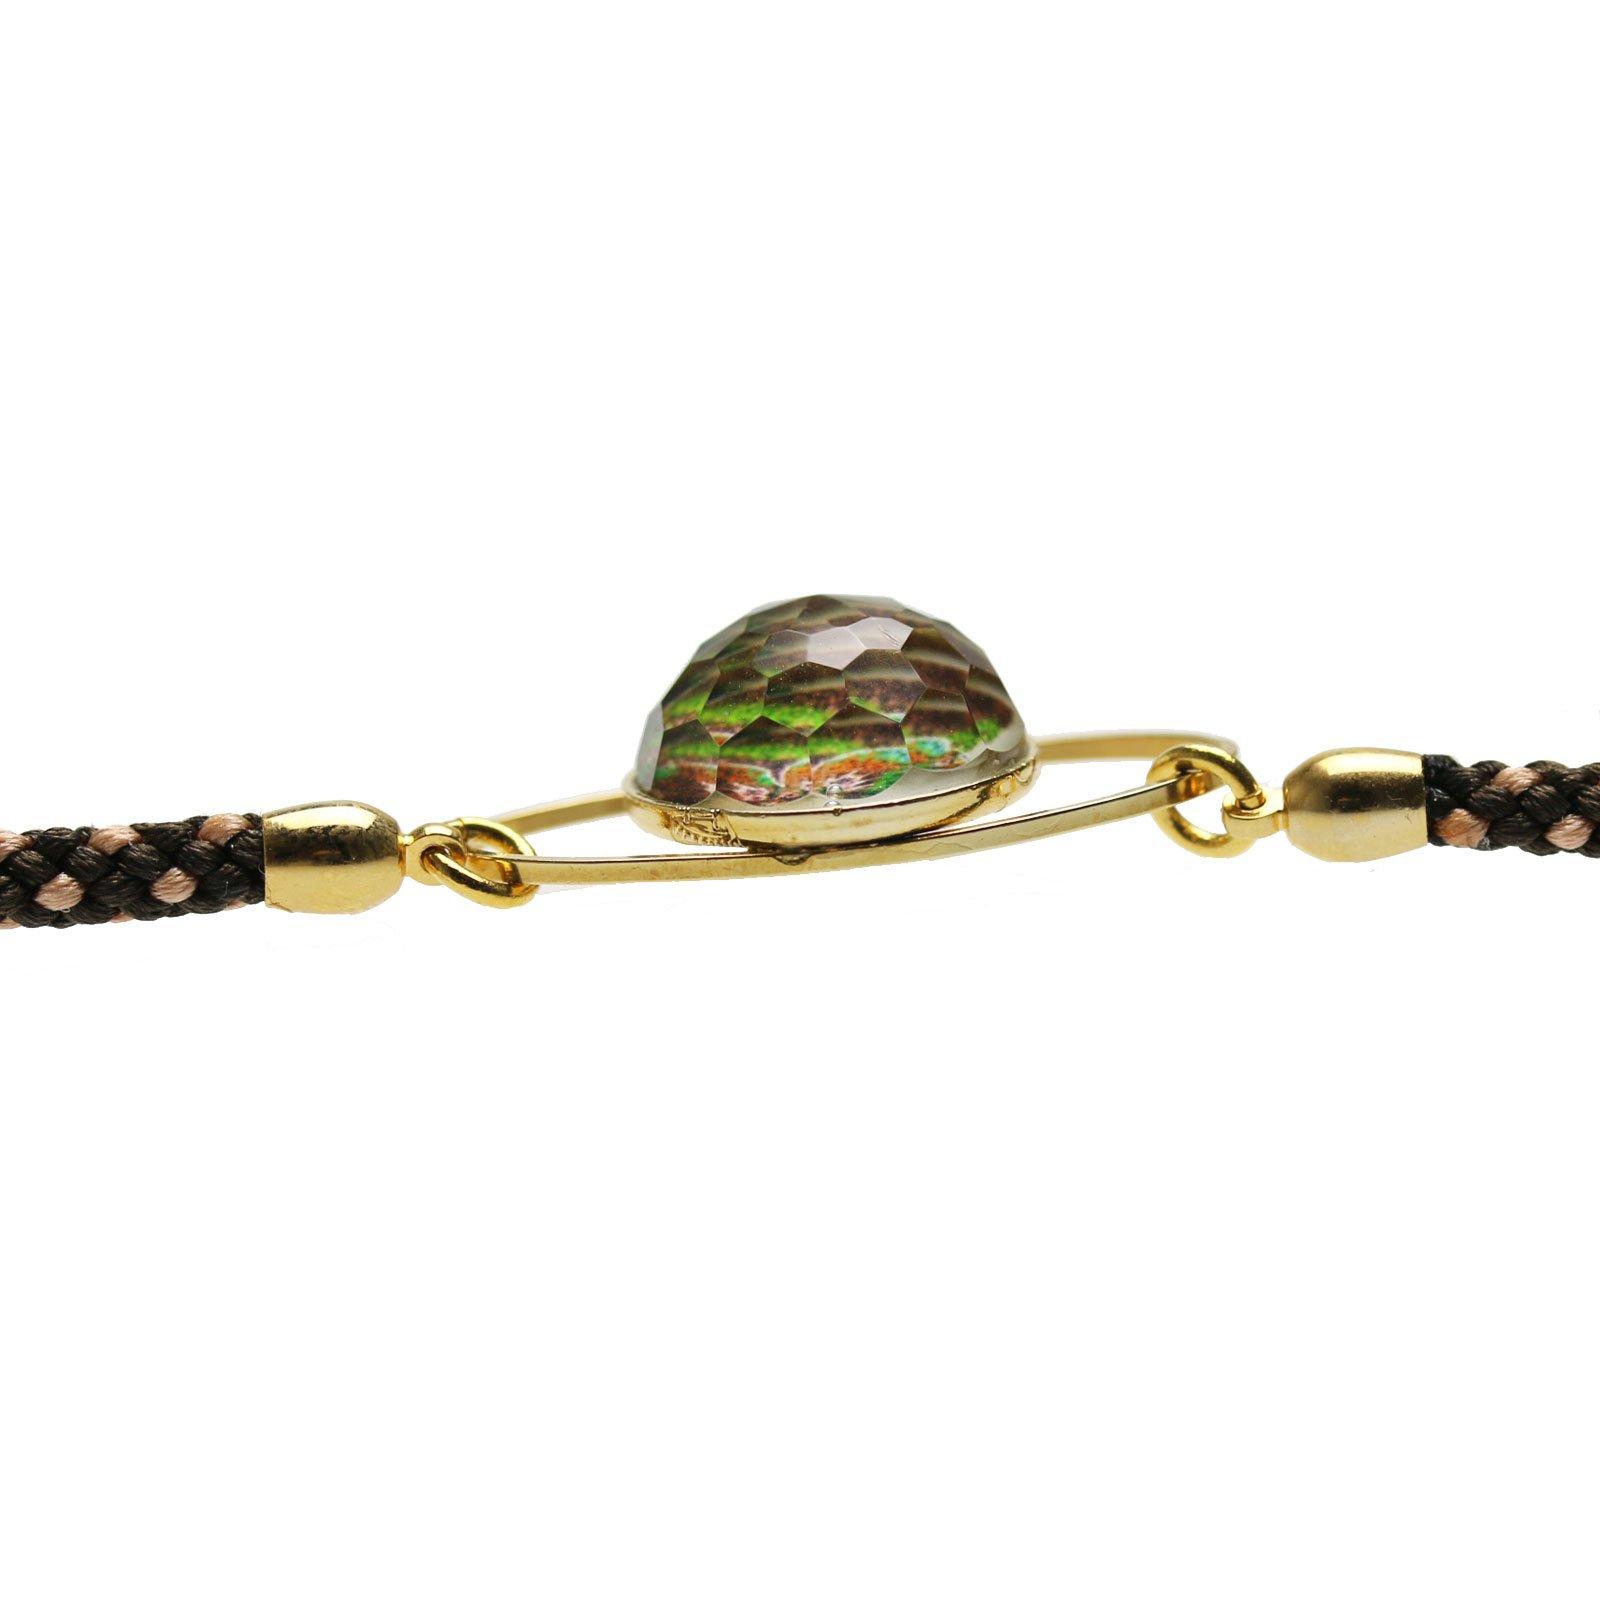 Tamarusan Braided Eyeglass Cord Eyeglasses Chain Handmade Pansy Gold